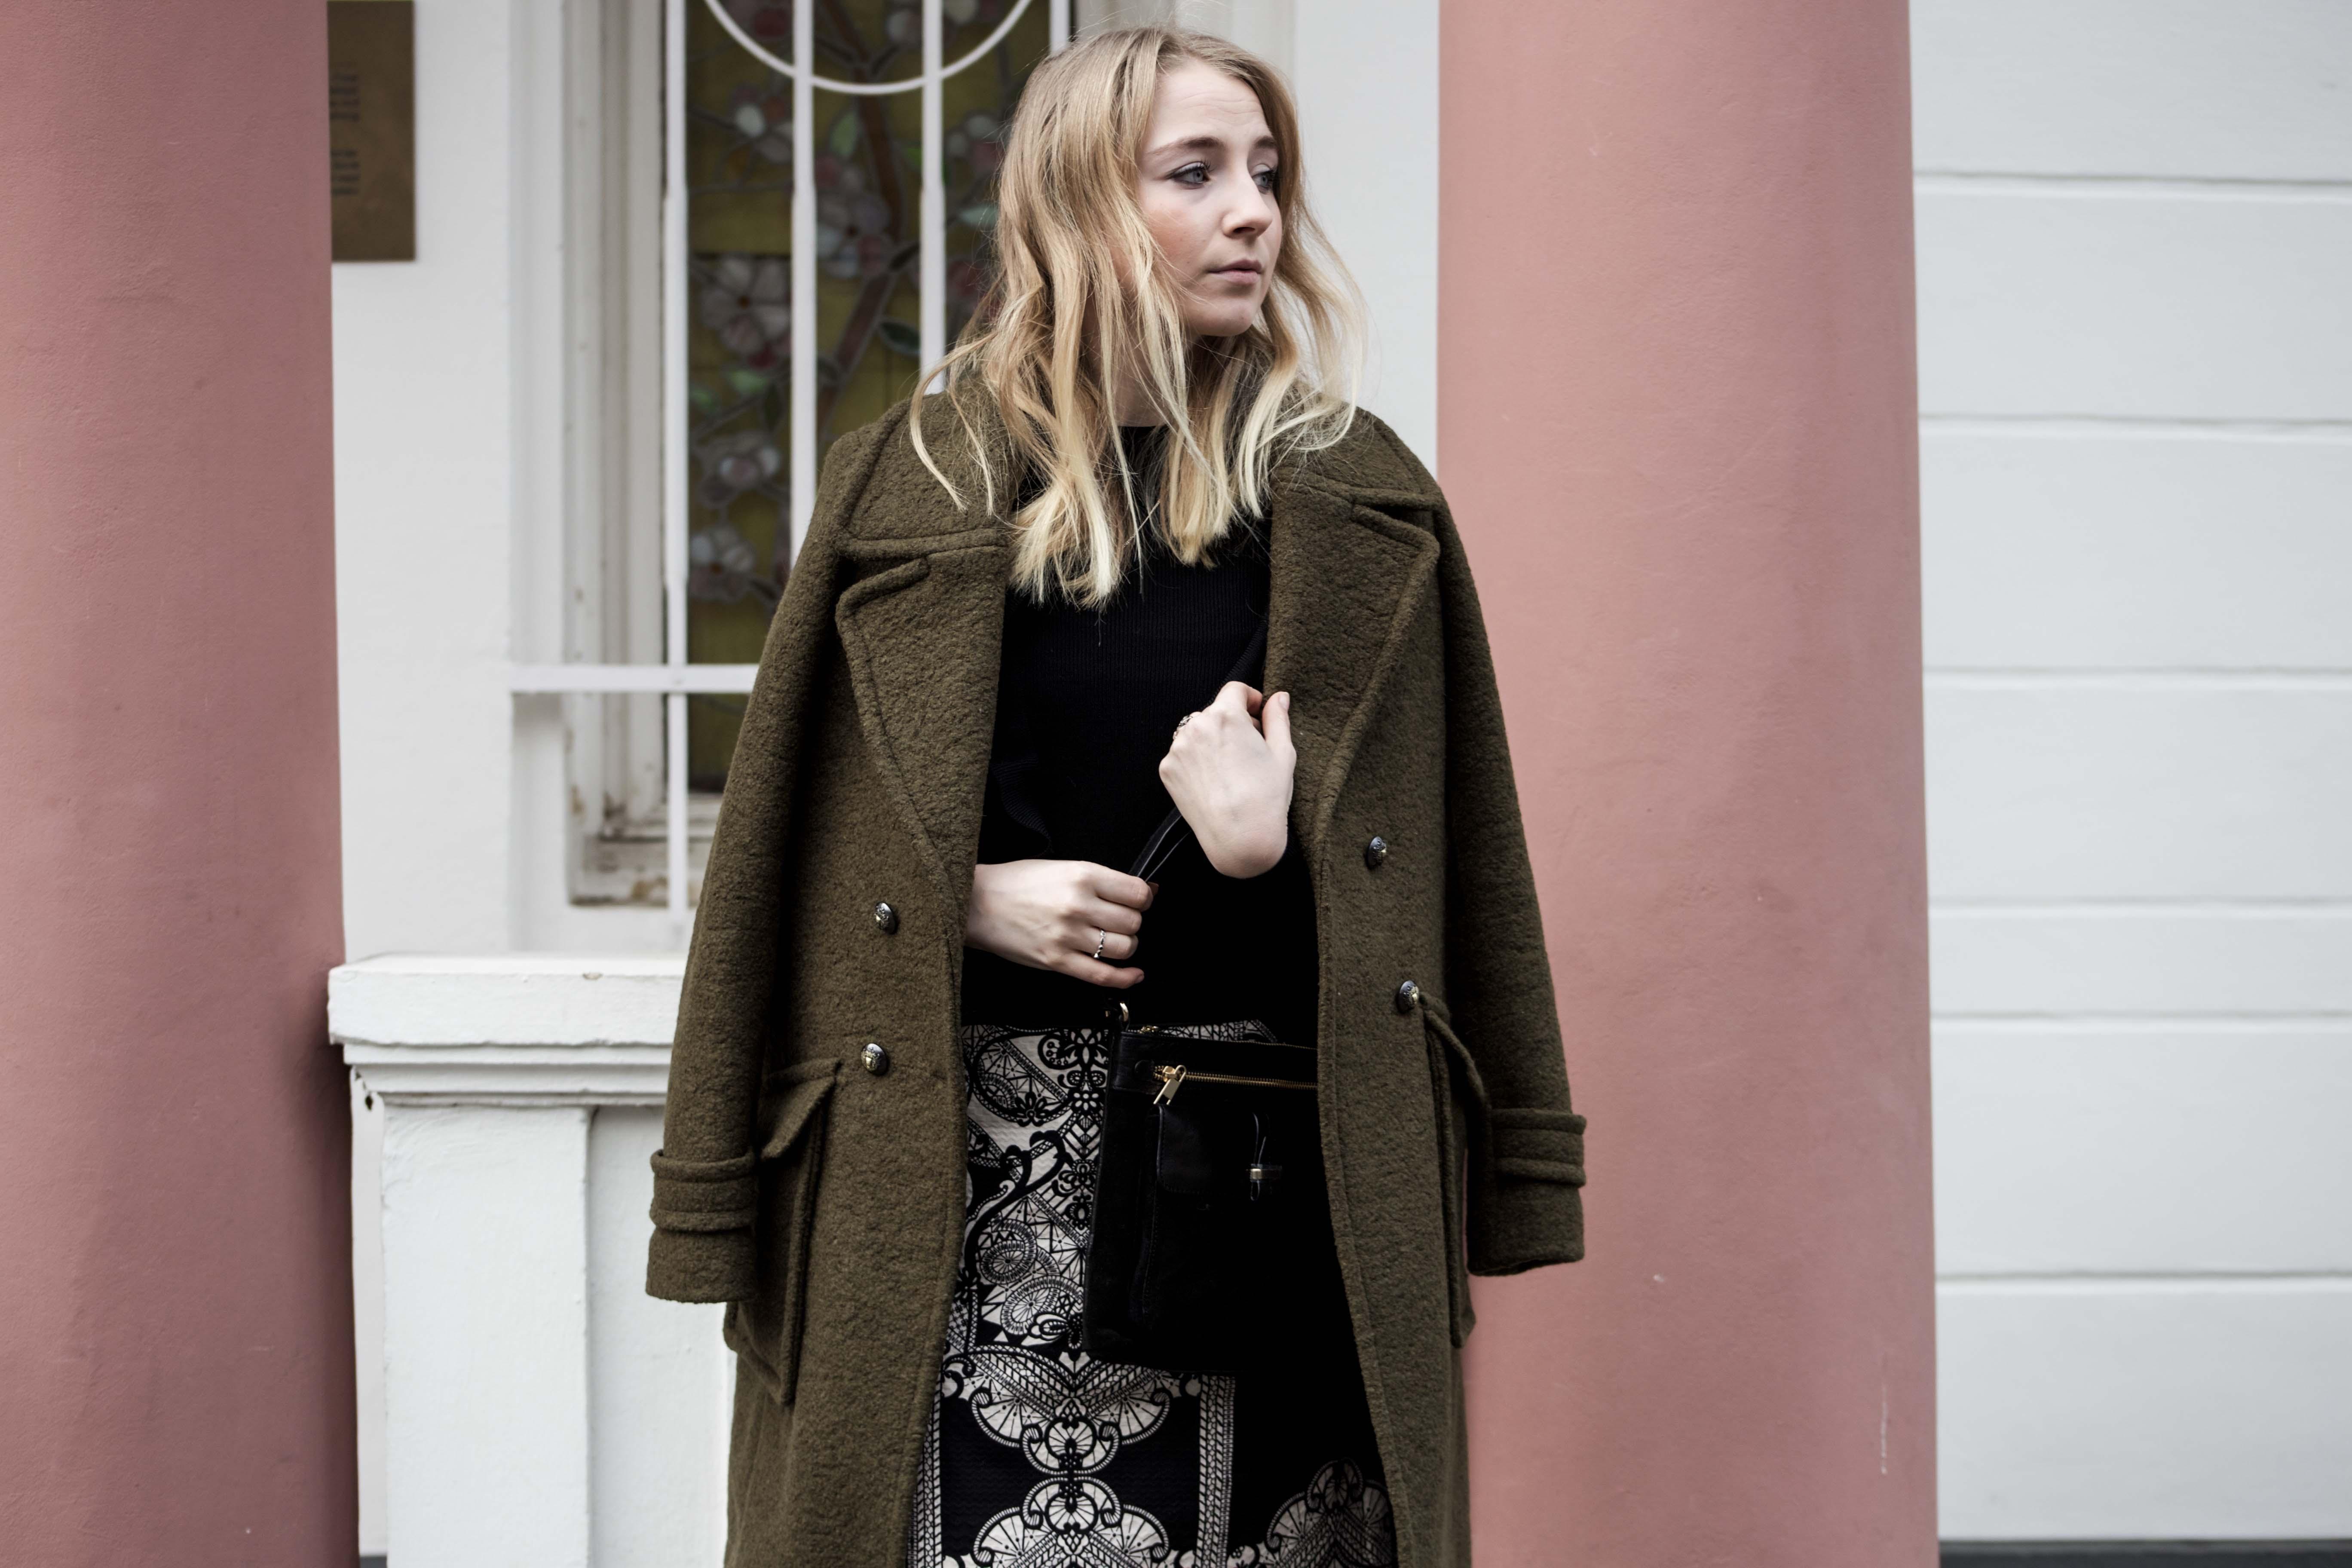 streetstyle-bonn-waldgrüner-mantel-rock-muster-print-fashionblogger-modeblog-mode-outfit_0114